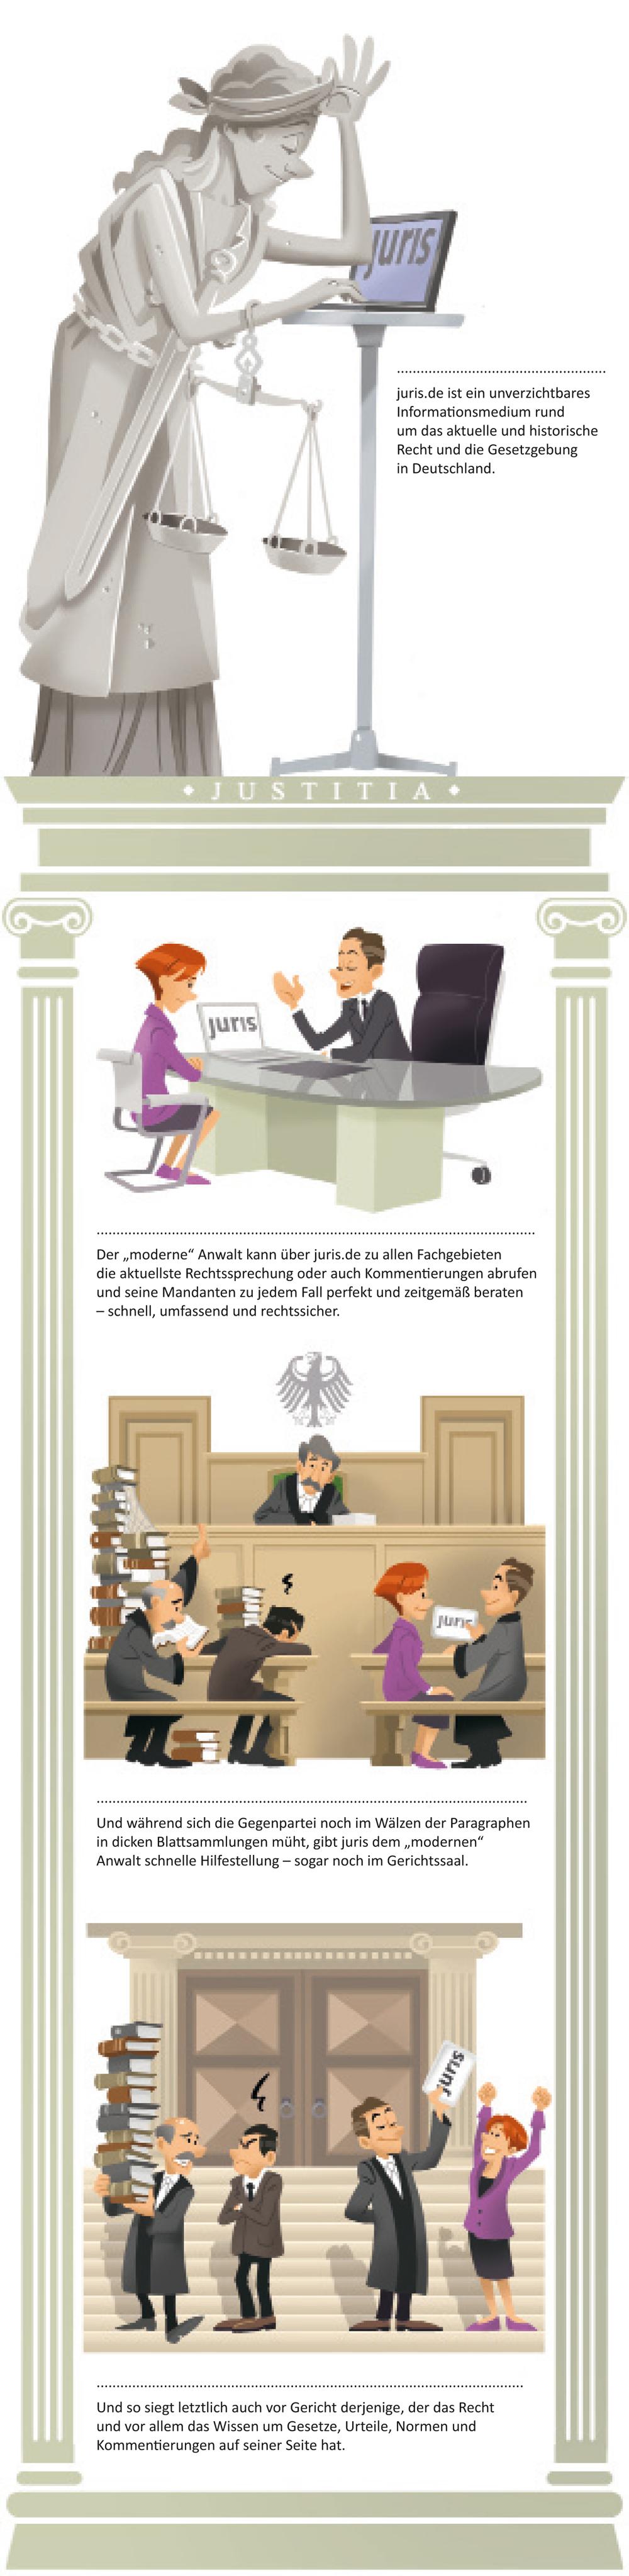 infografik_juris